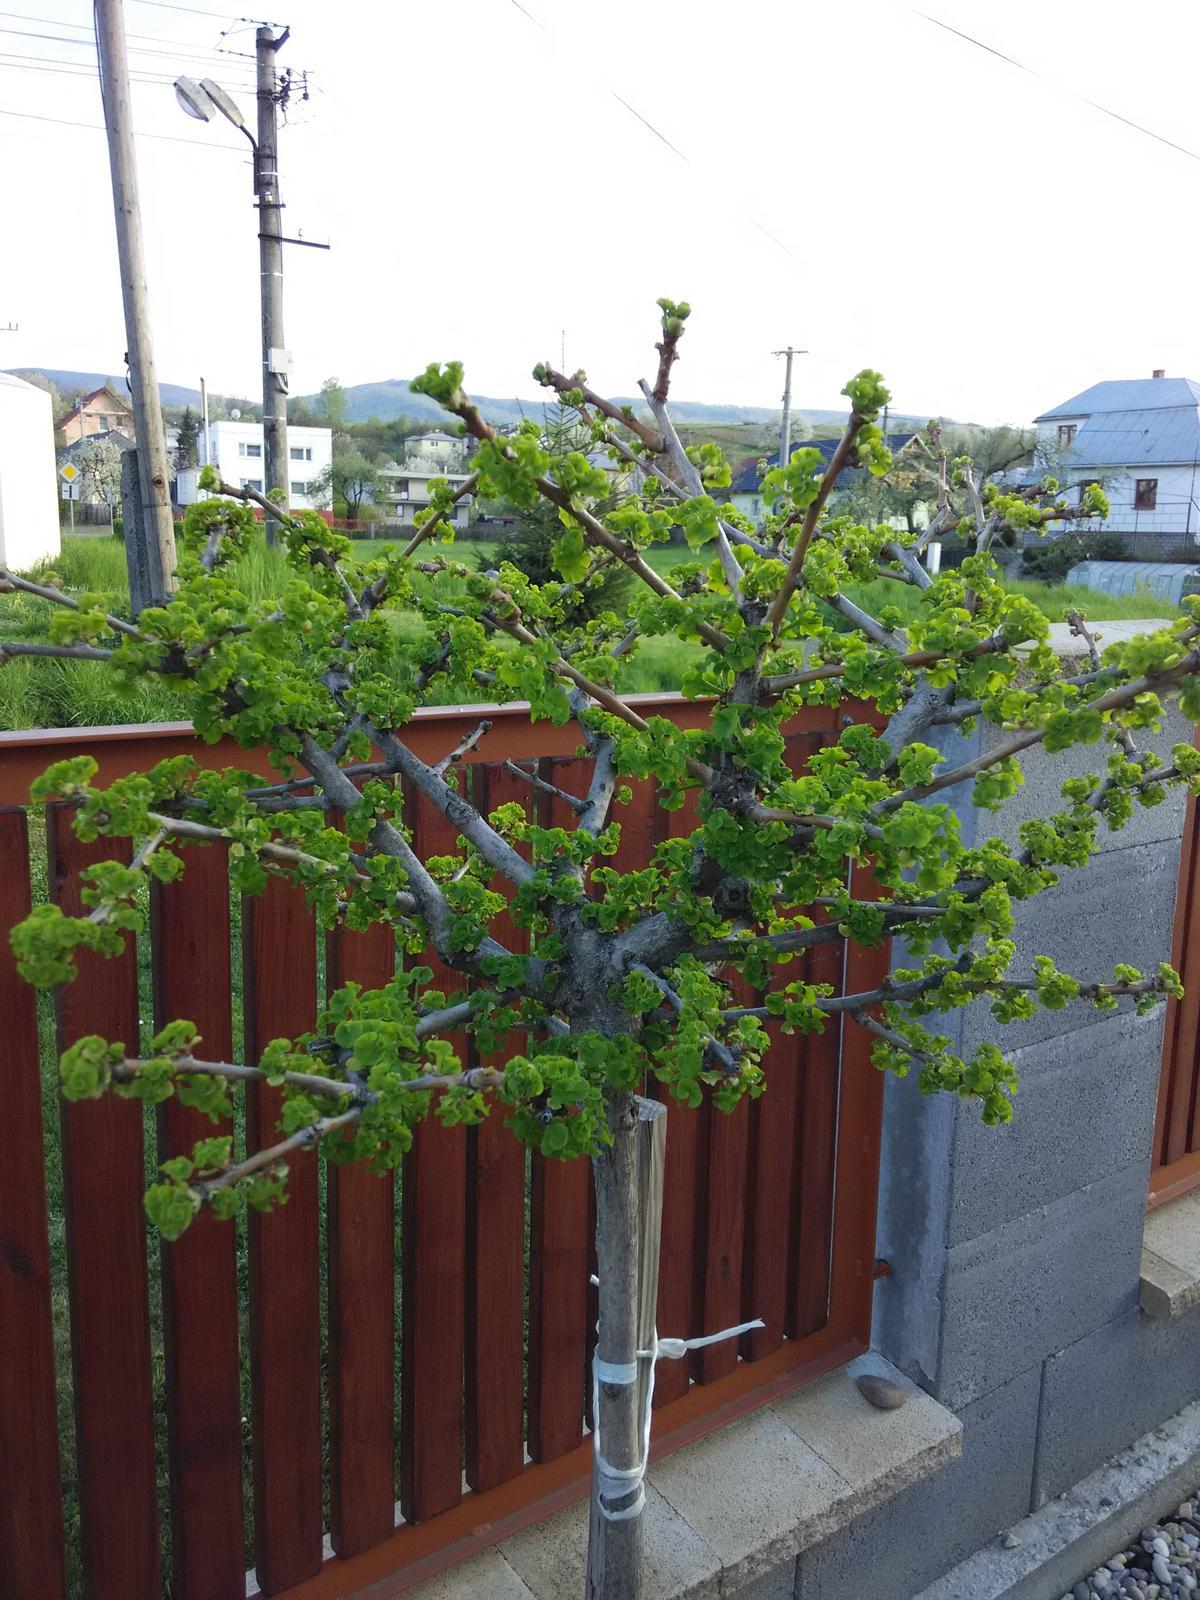 Dvor a zahrada 2015 - ginkgo